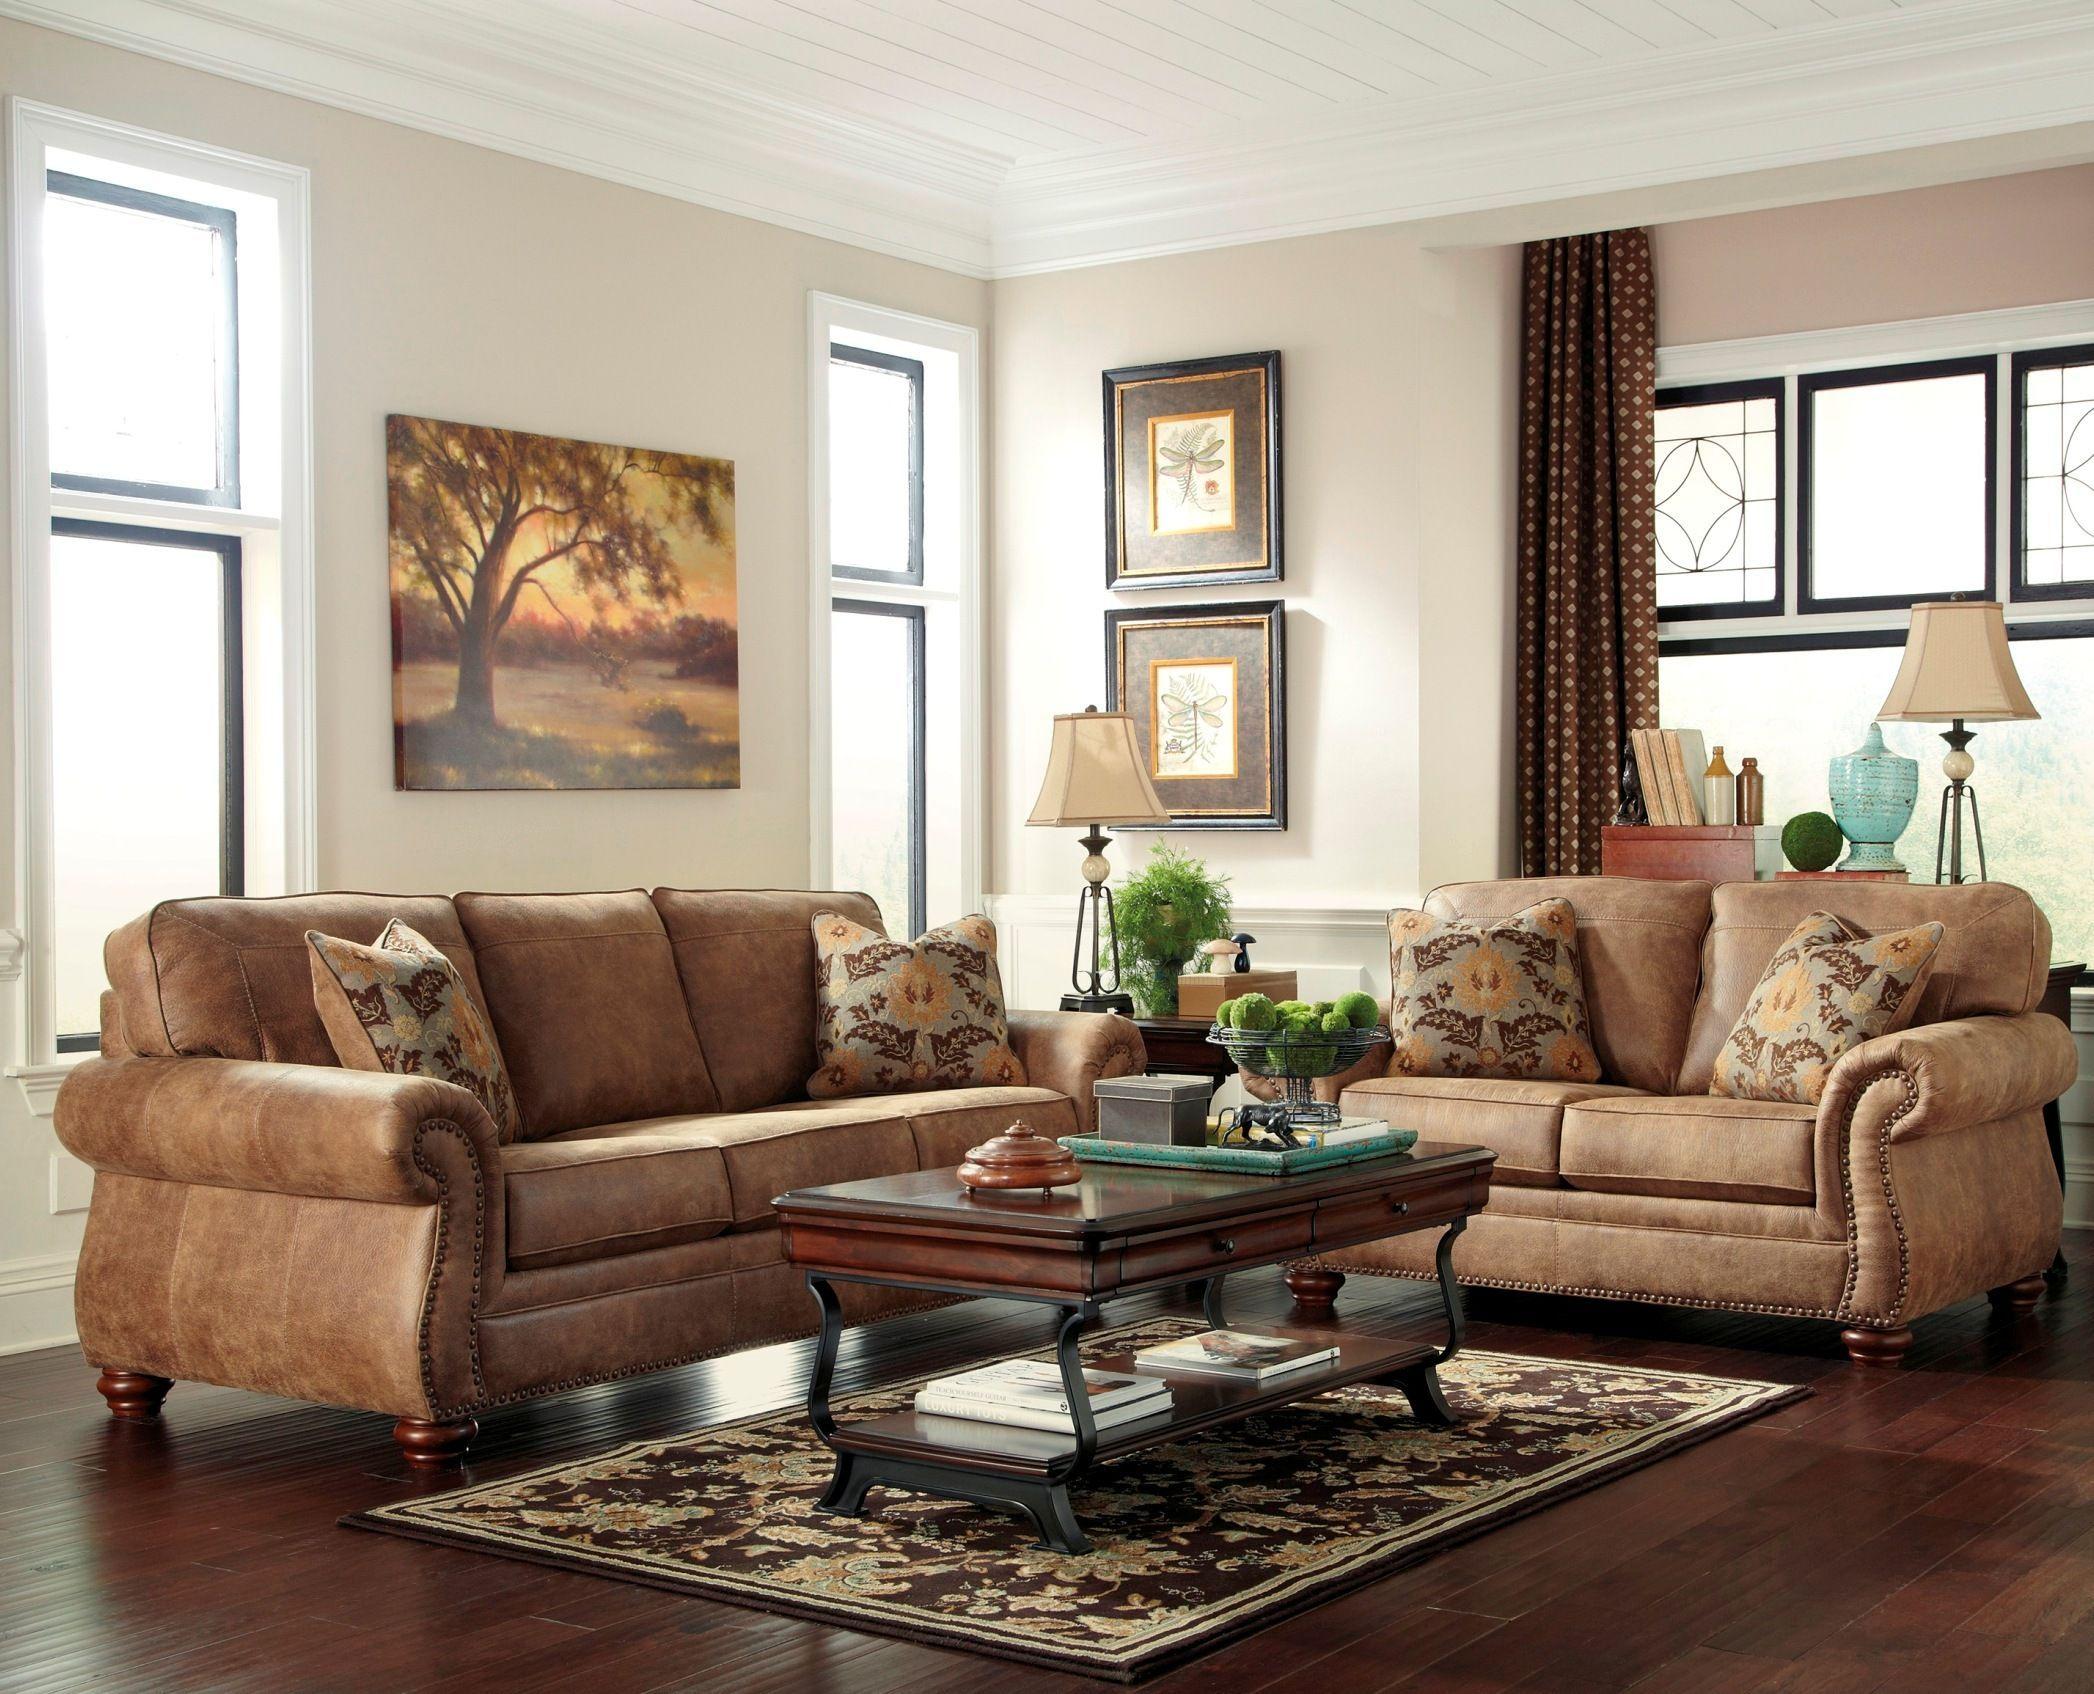 Larkinhurst Earth Living Room Set Asl 3190138 Room Homedecorwallartideas In 2020 Brown Living Room Brown Couch Living Room Living Room Decor Gray